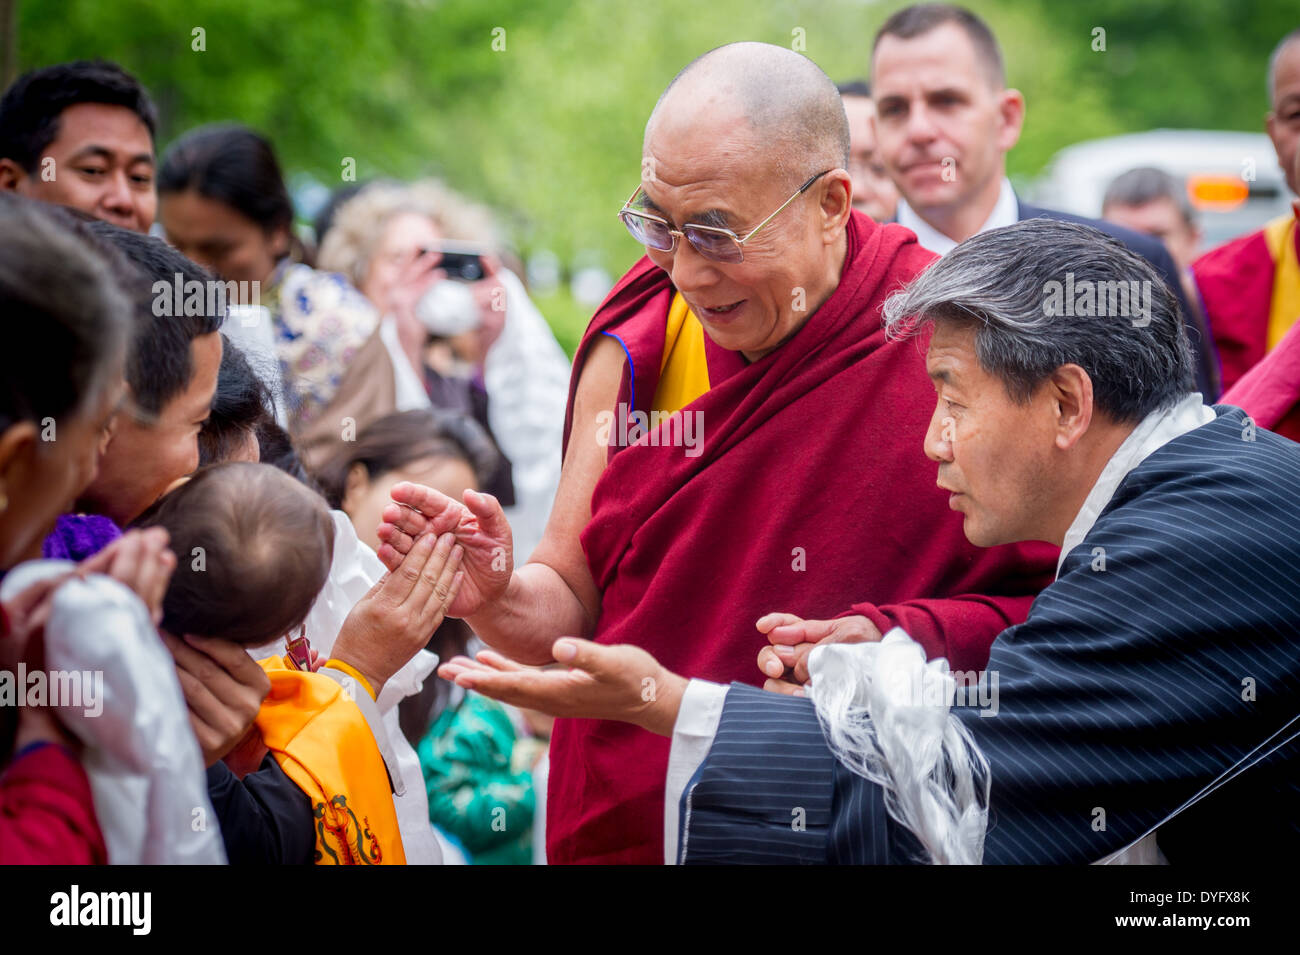 Dalai Lama Arrives at University of Maryland - Stock Image